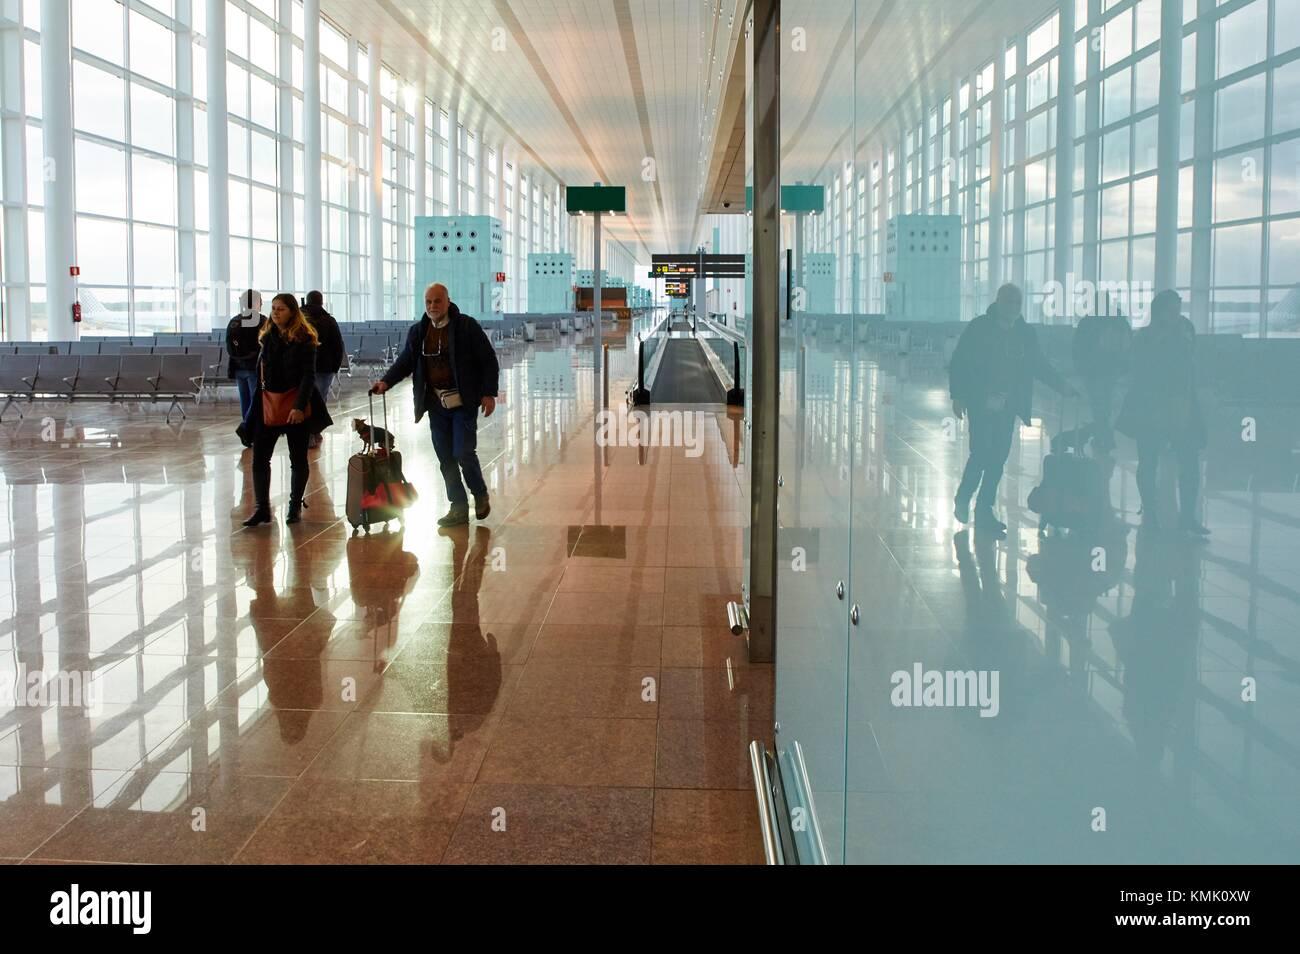 El Prat Airport, Barcelona, Catalonia, Spain - Stock Image